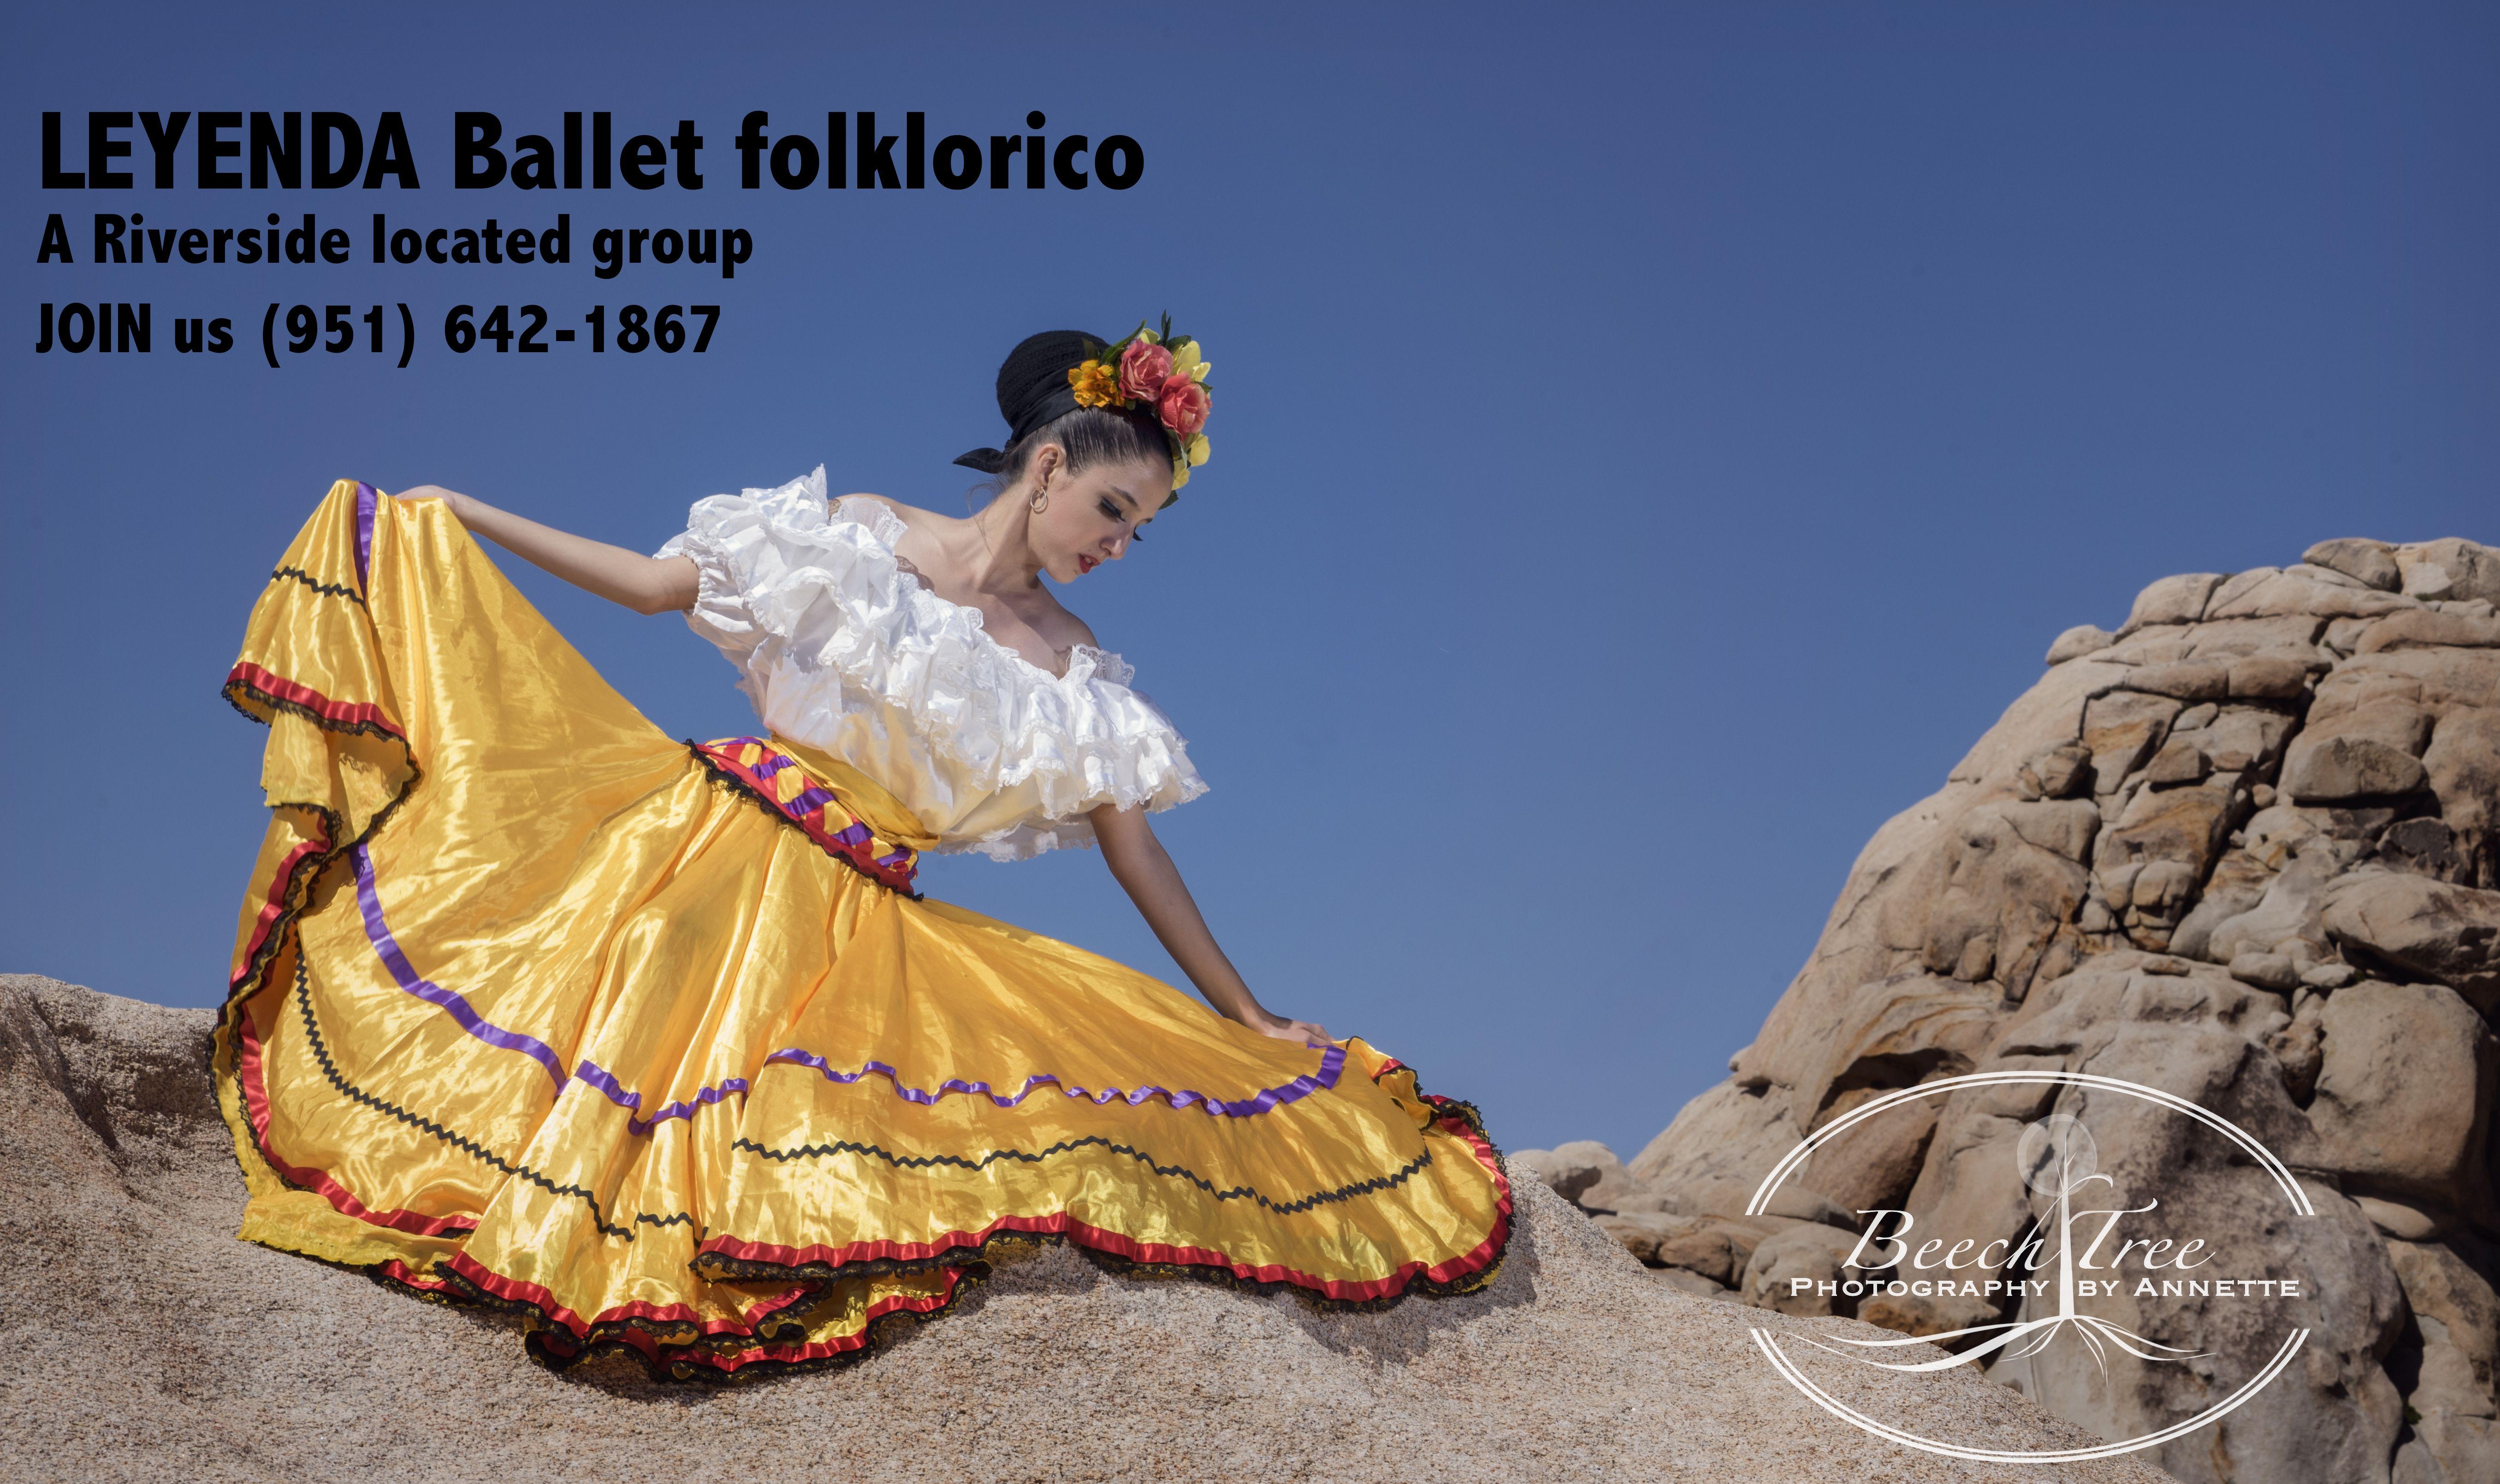 Pin By Leyenda Ballet Folklorico On Ballet Folklorico Ballet Folklorico Ballet Los Angeles